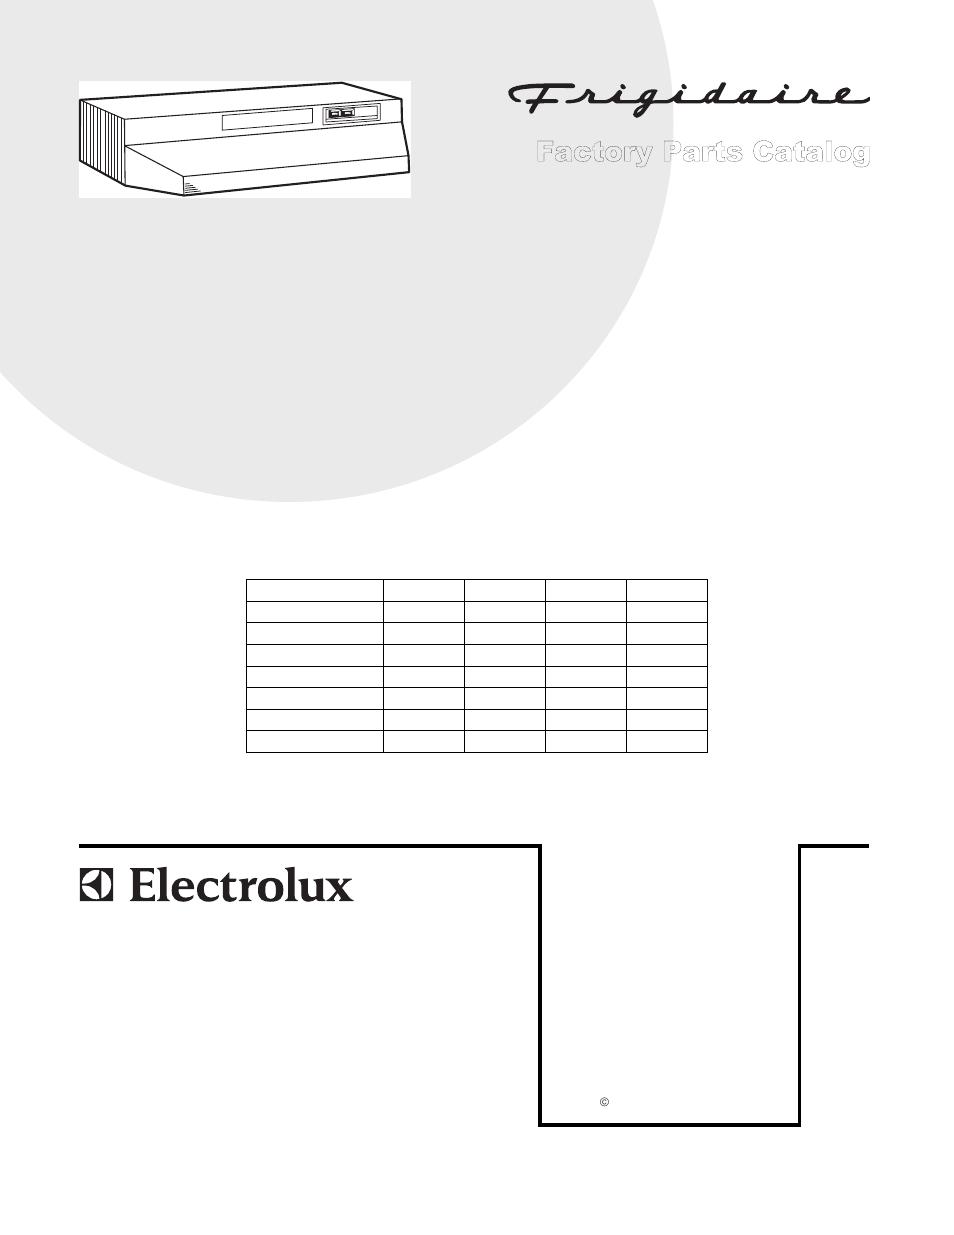 Electrolux Range Wiring Diagram Explained Diagrams Microwave E30m075hps Frigidaire F30wc19e User Manual 4 Pages Miele Vacuum Parts